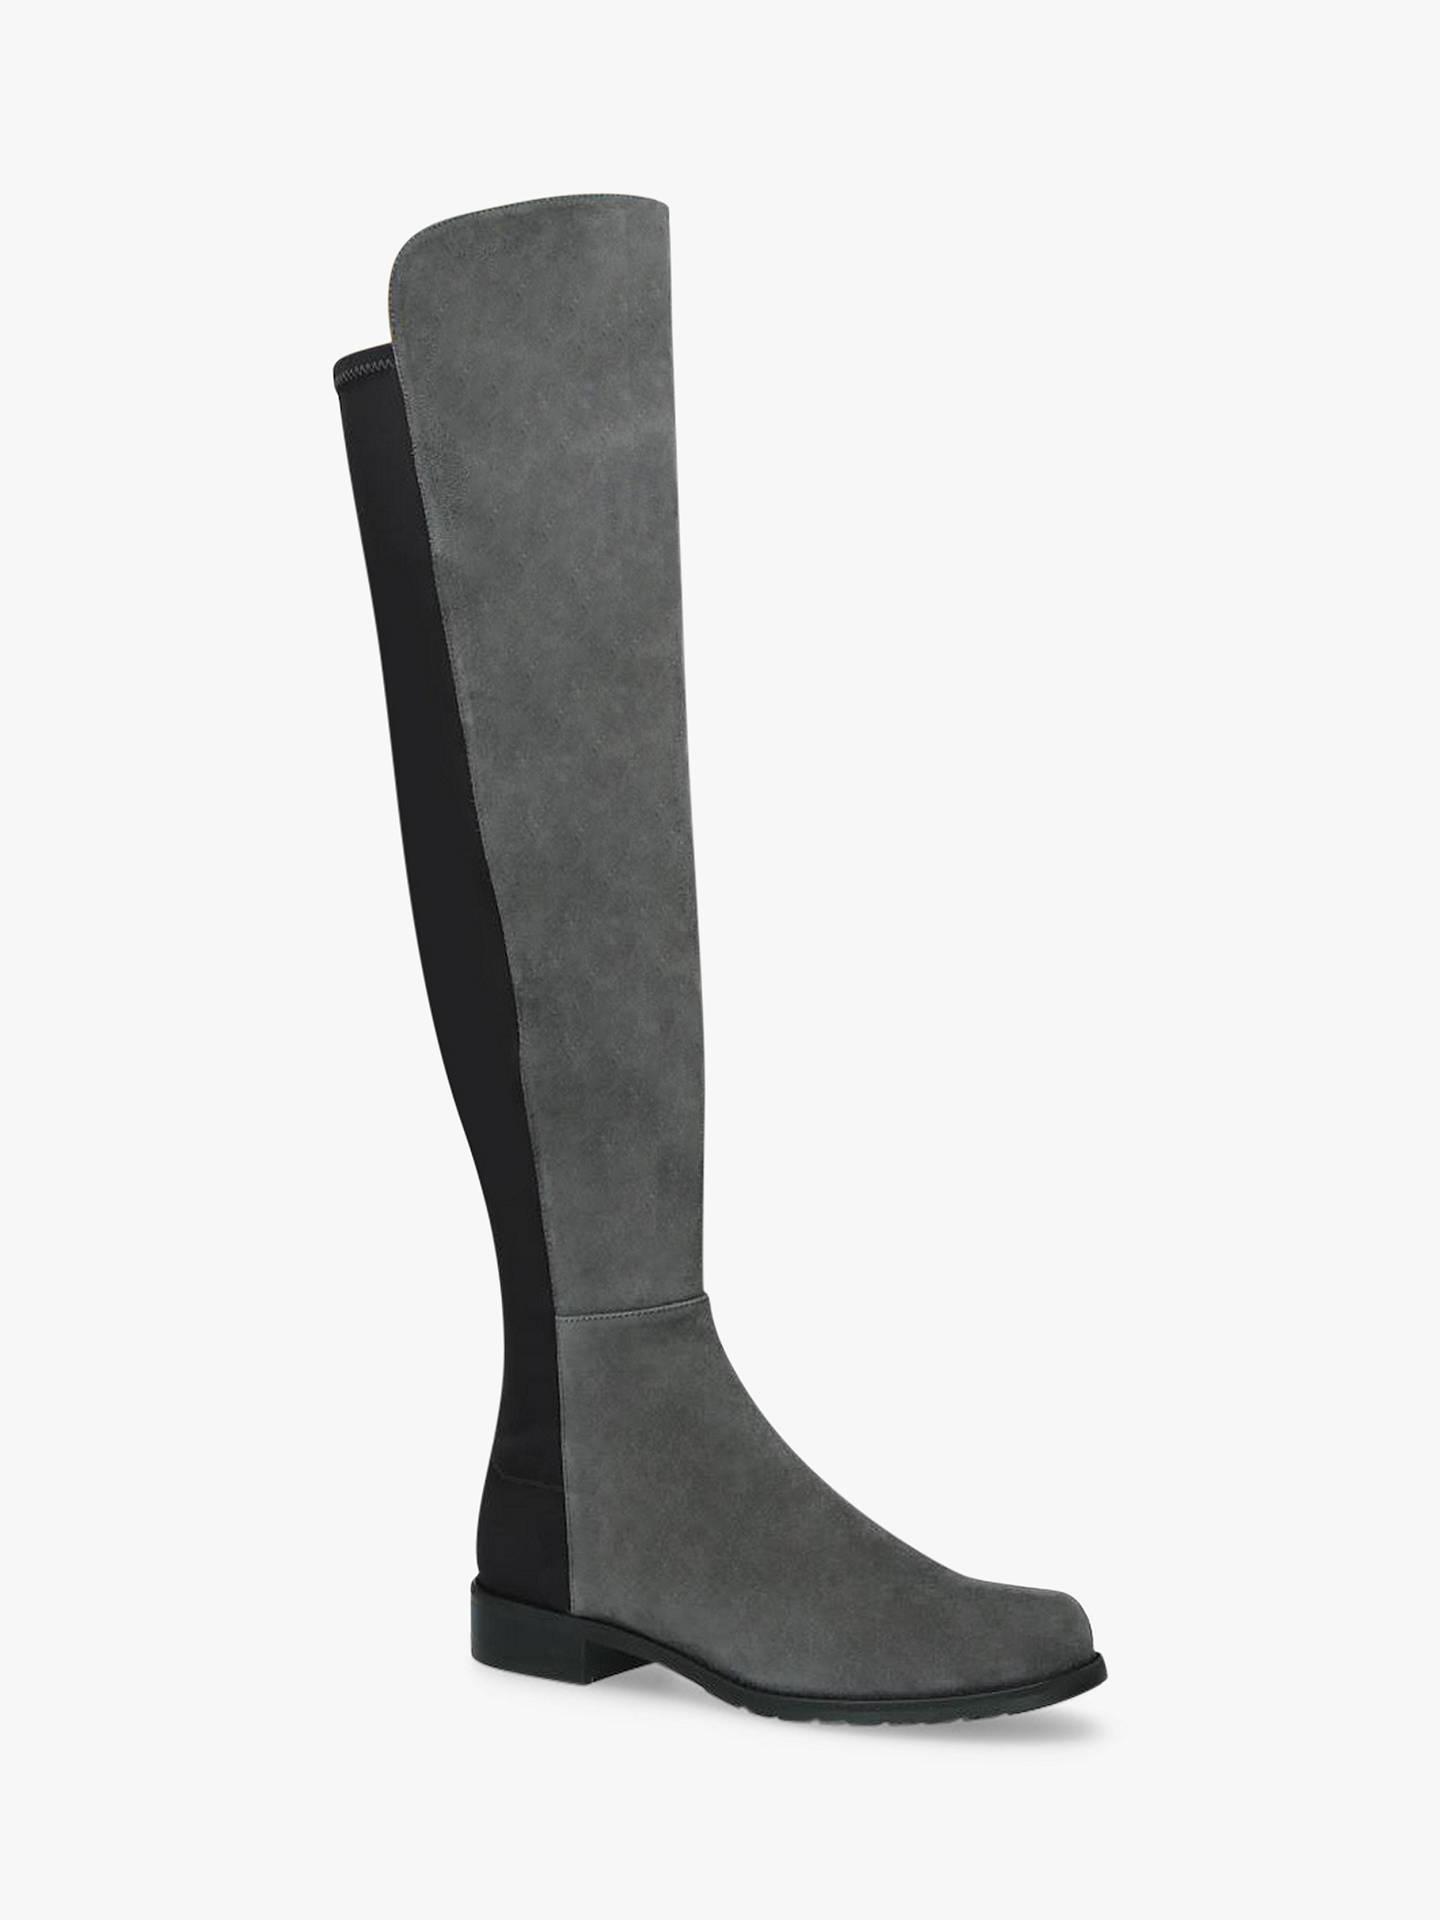 6c192d1e018 Stuart Weitzman 50 50 Block Heel Knee High Boots at John Lewis ...